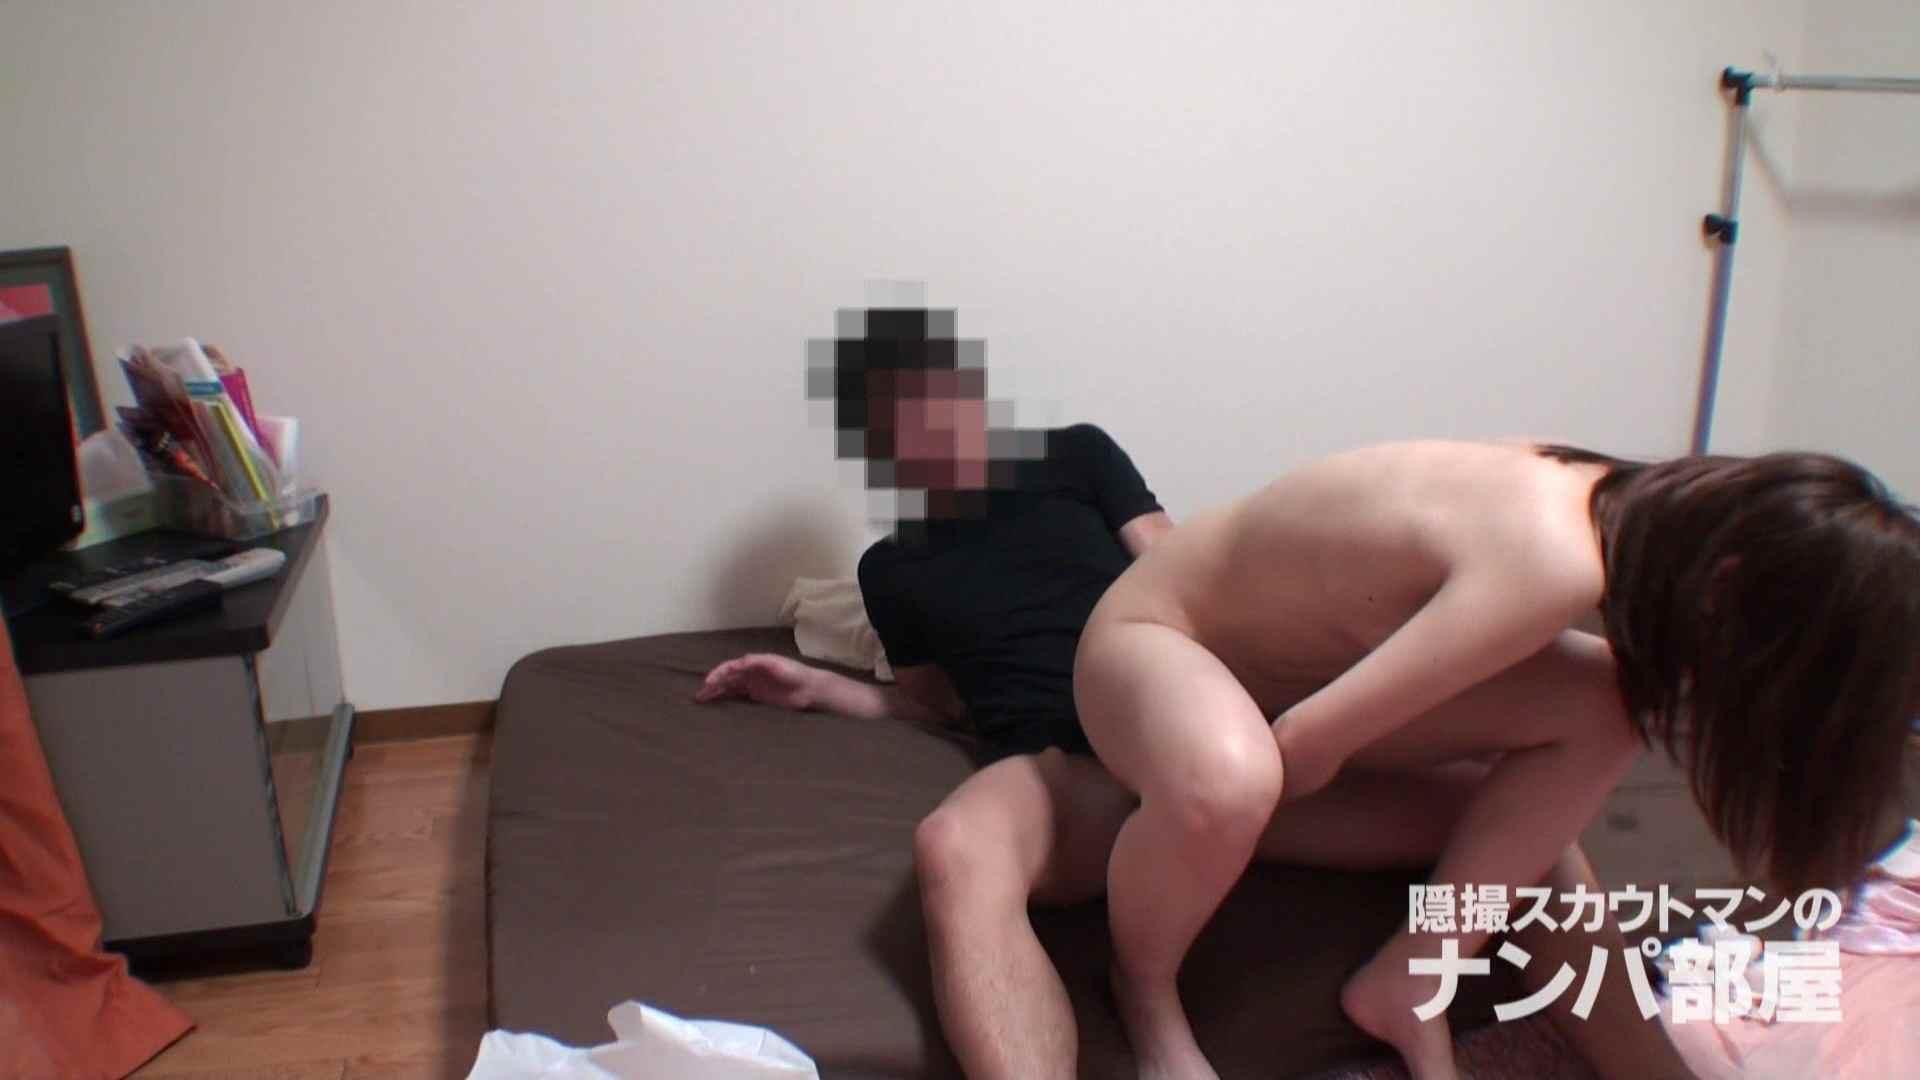 vol.6 kana ナンパして | セックス  99枚 41